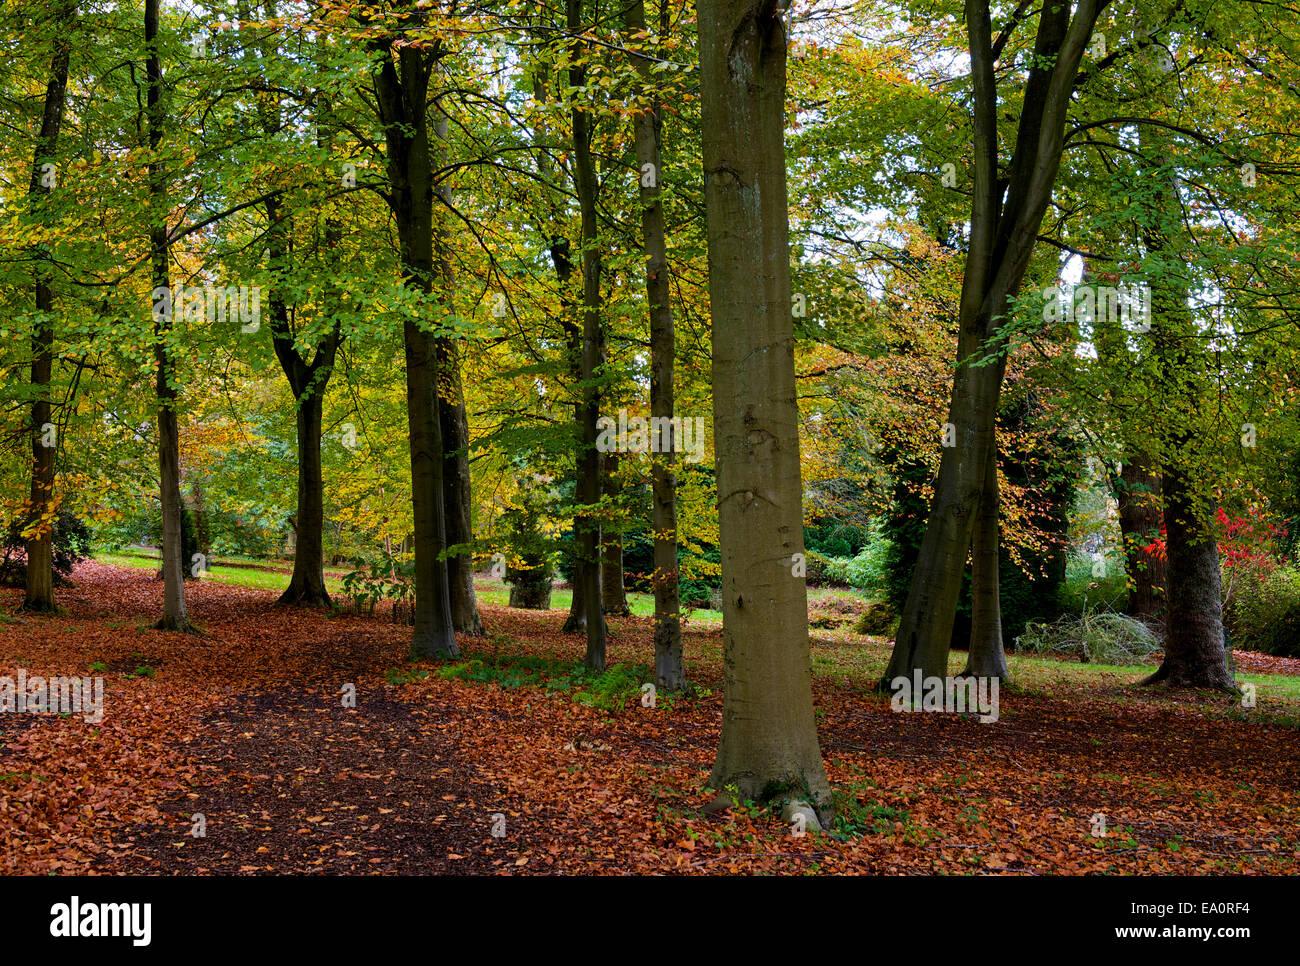 Batsford Arboretum, near Moreton-in-the-Marsh, Gloucestershire, England UK - Stock Image